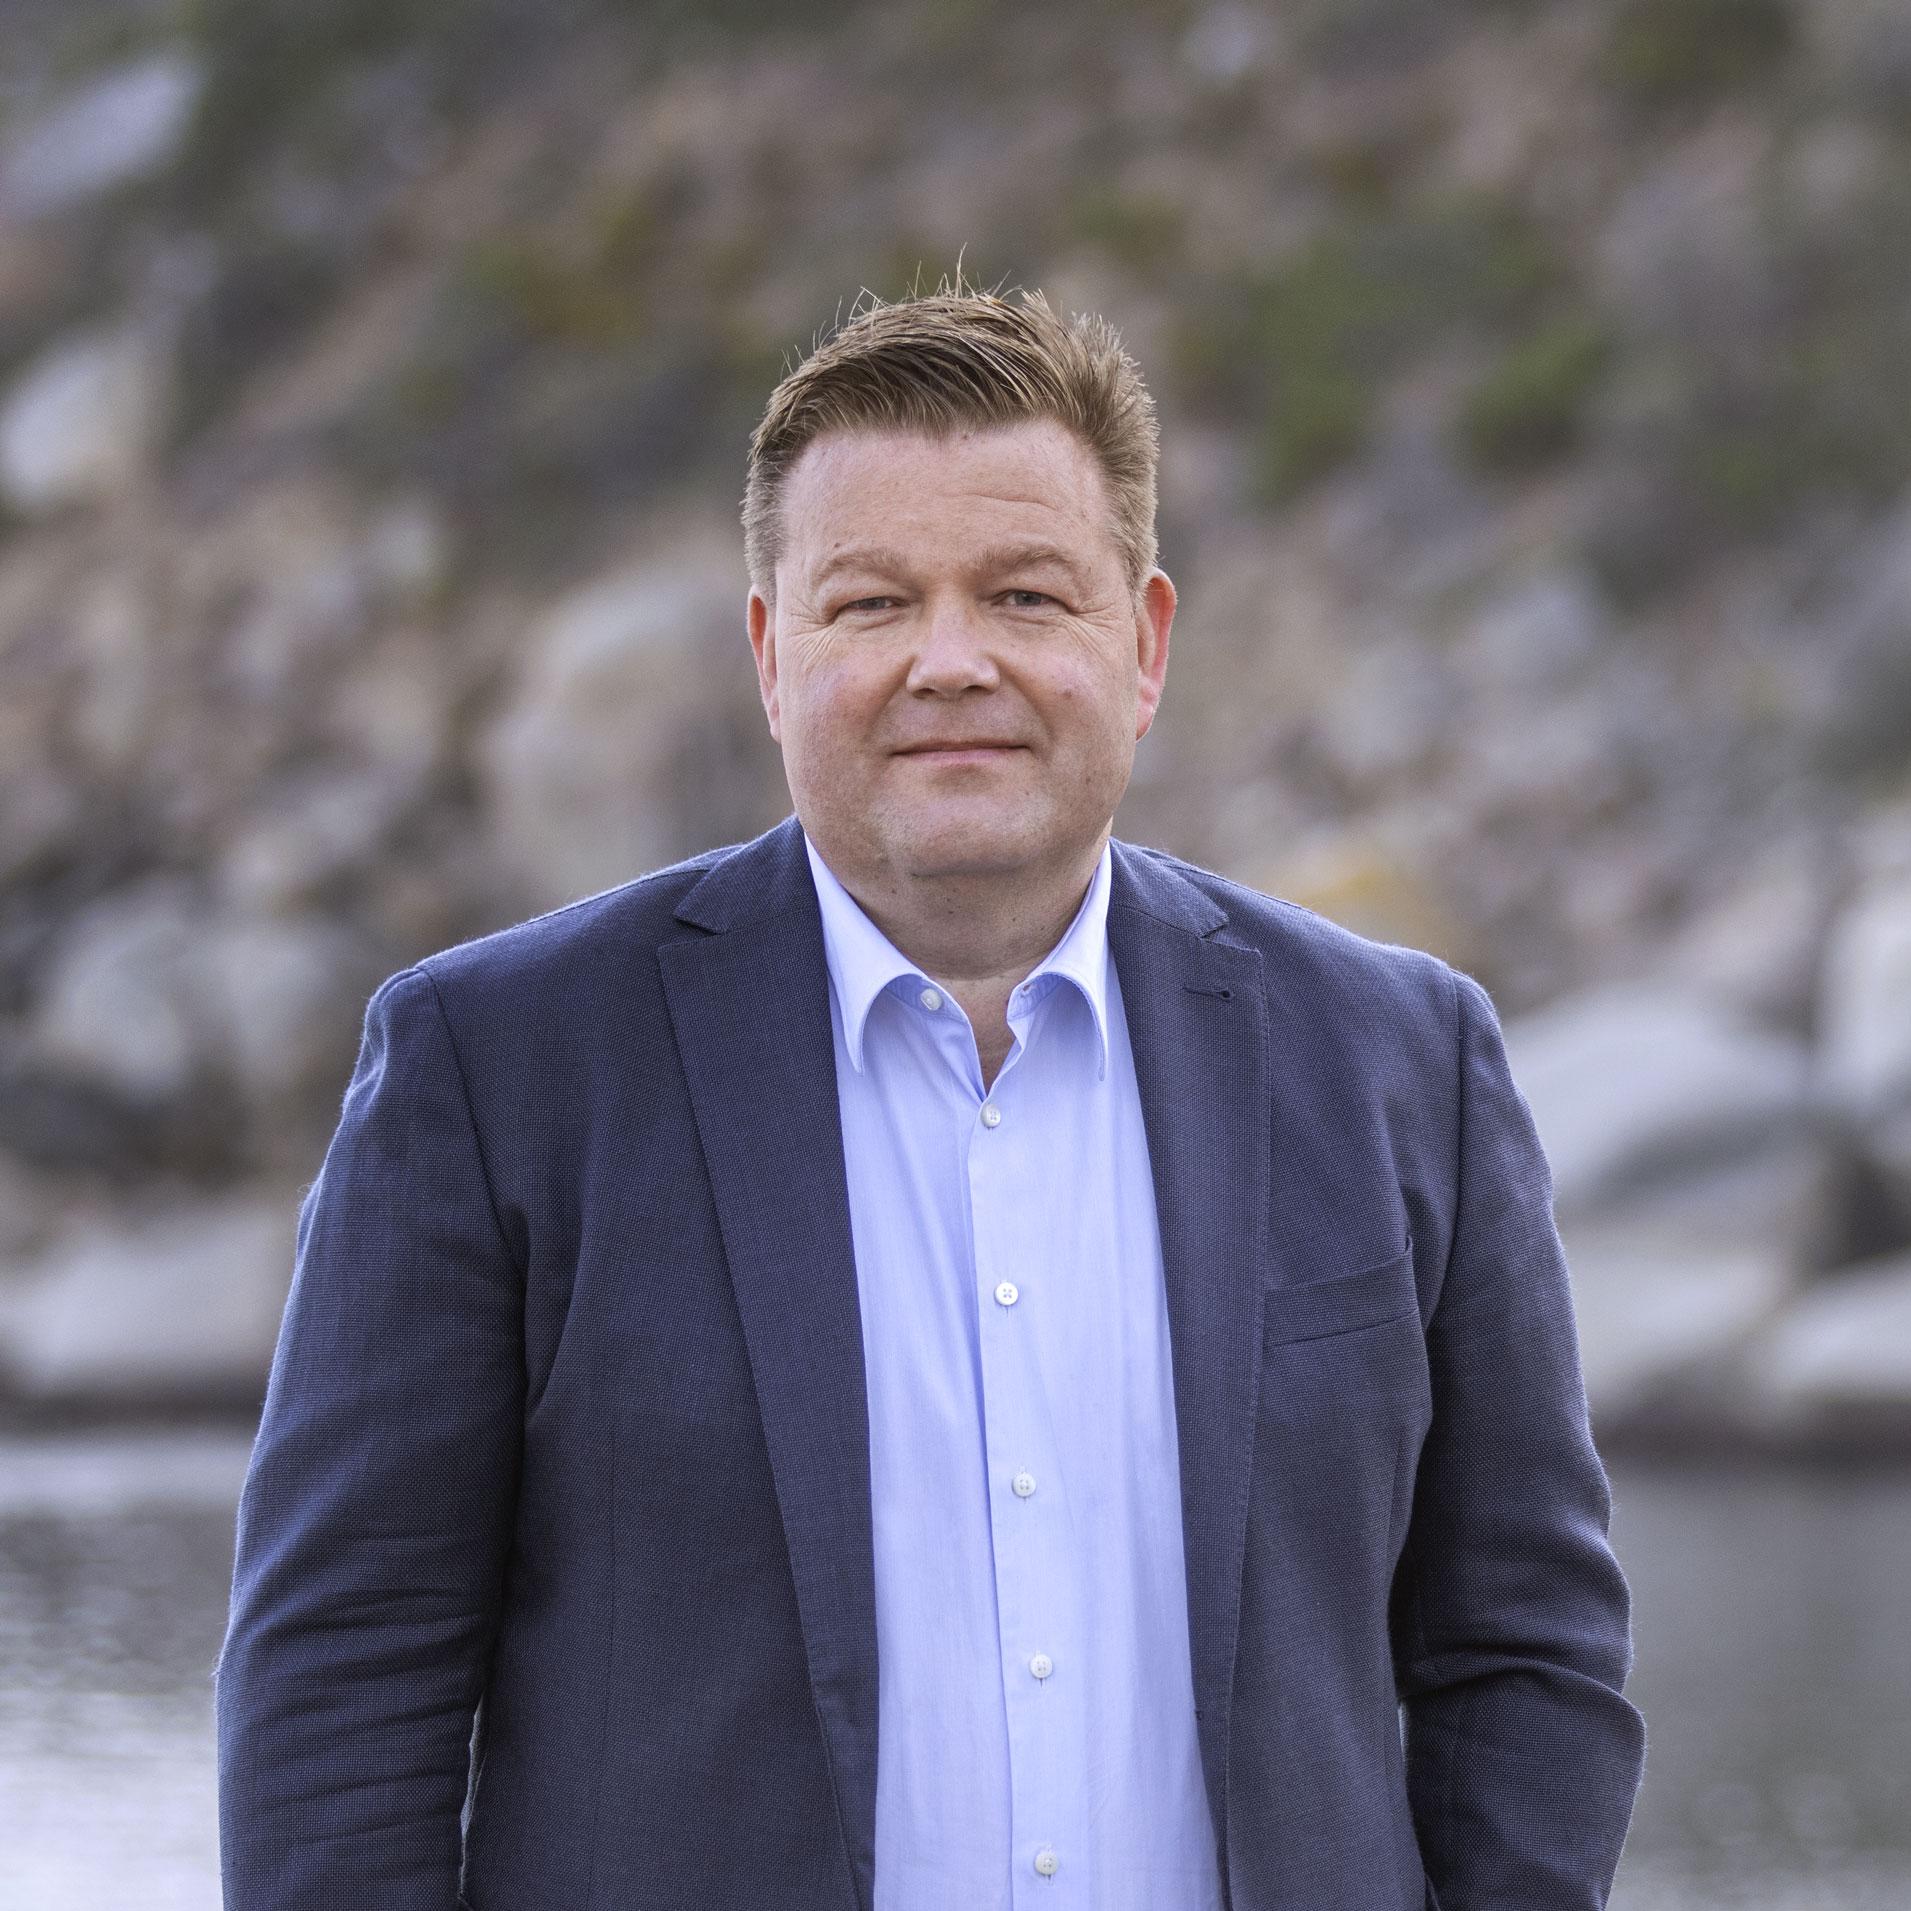 Carl Fredrik Sammeli